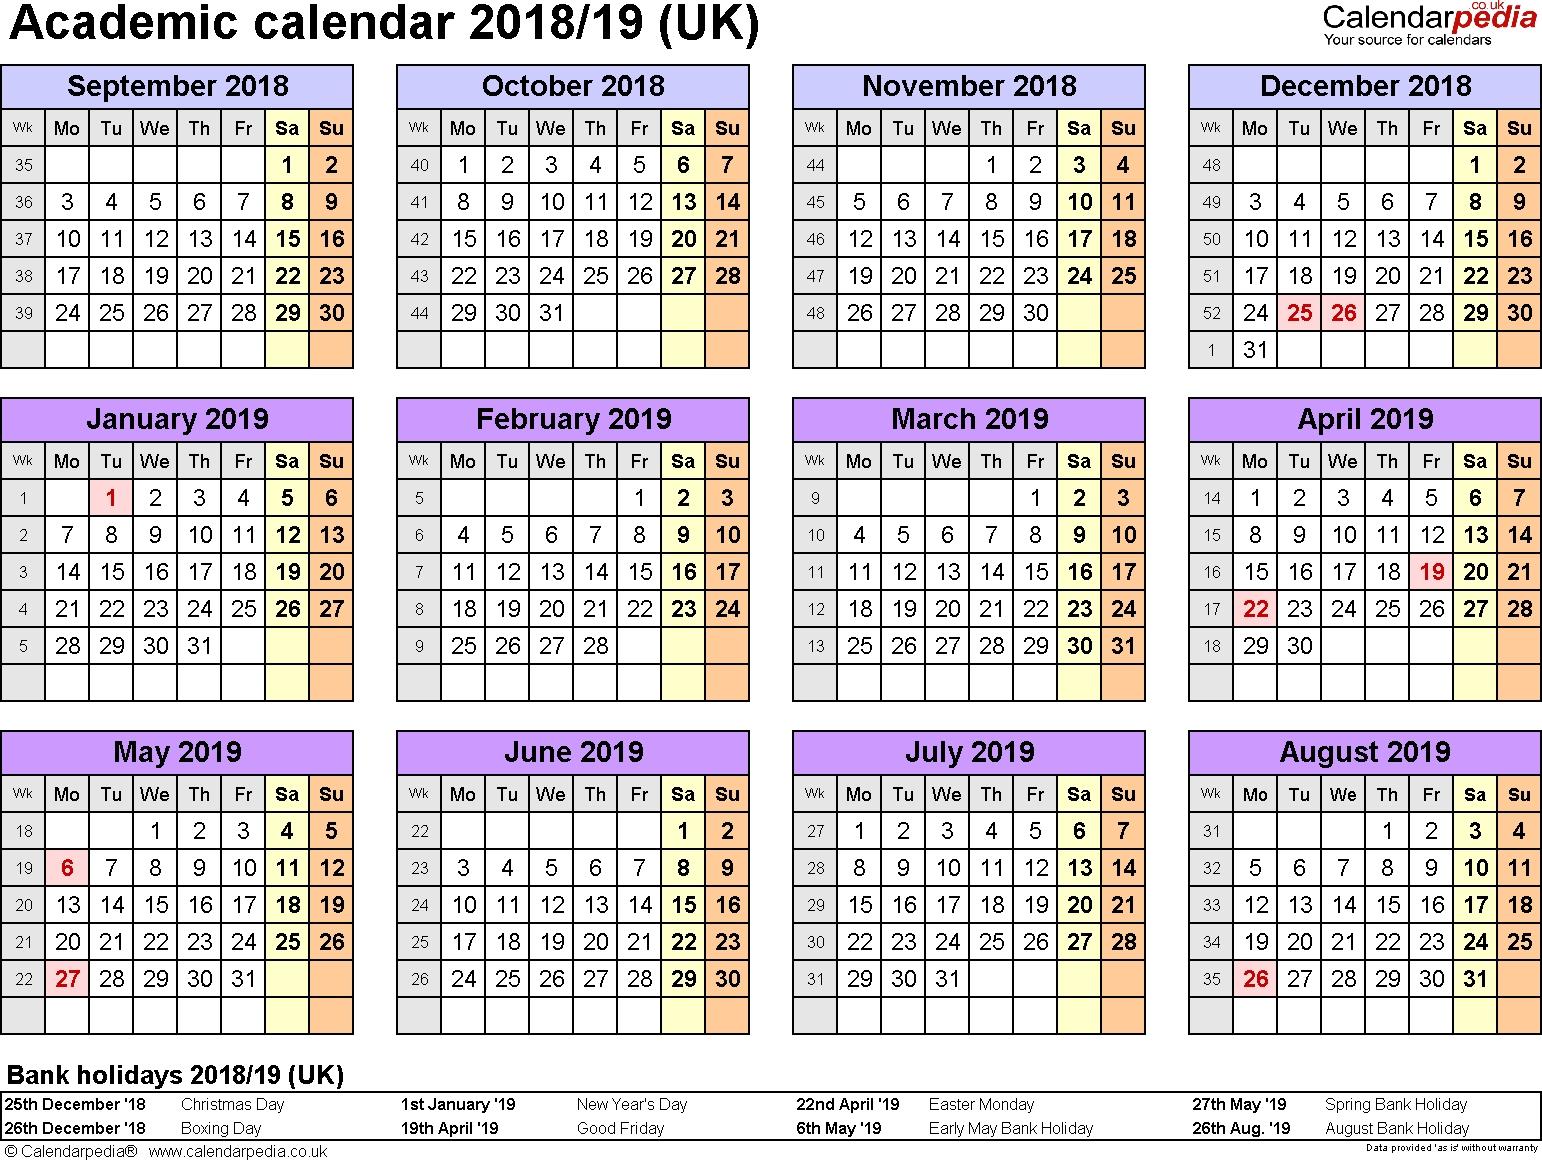 Academic Calendars 2018/2019 As Free Printable Word Templates Calendar 2019 19